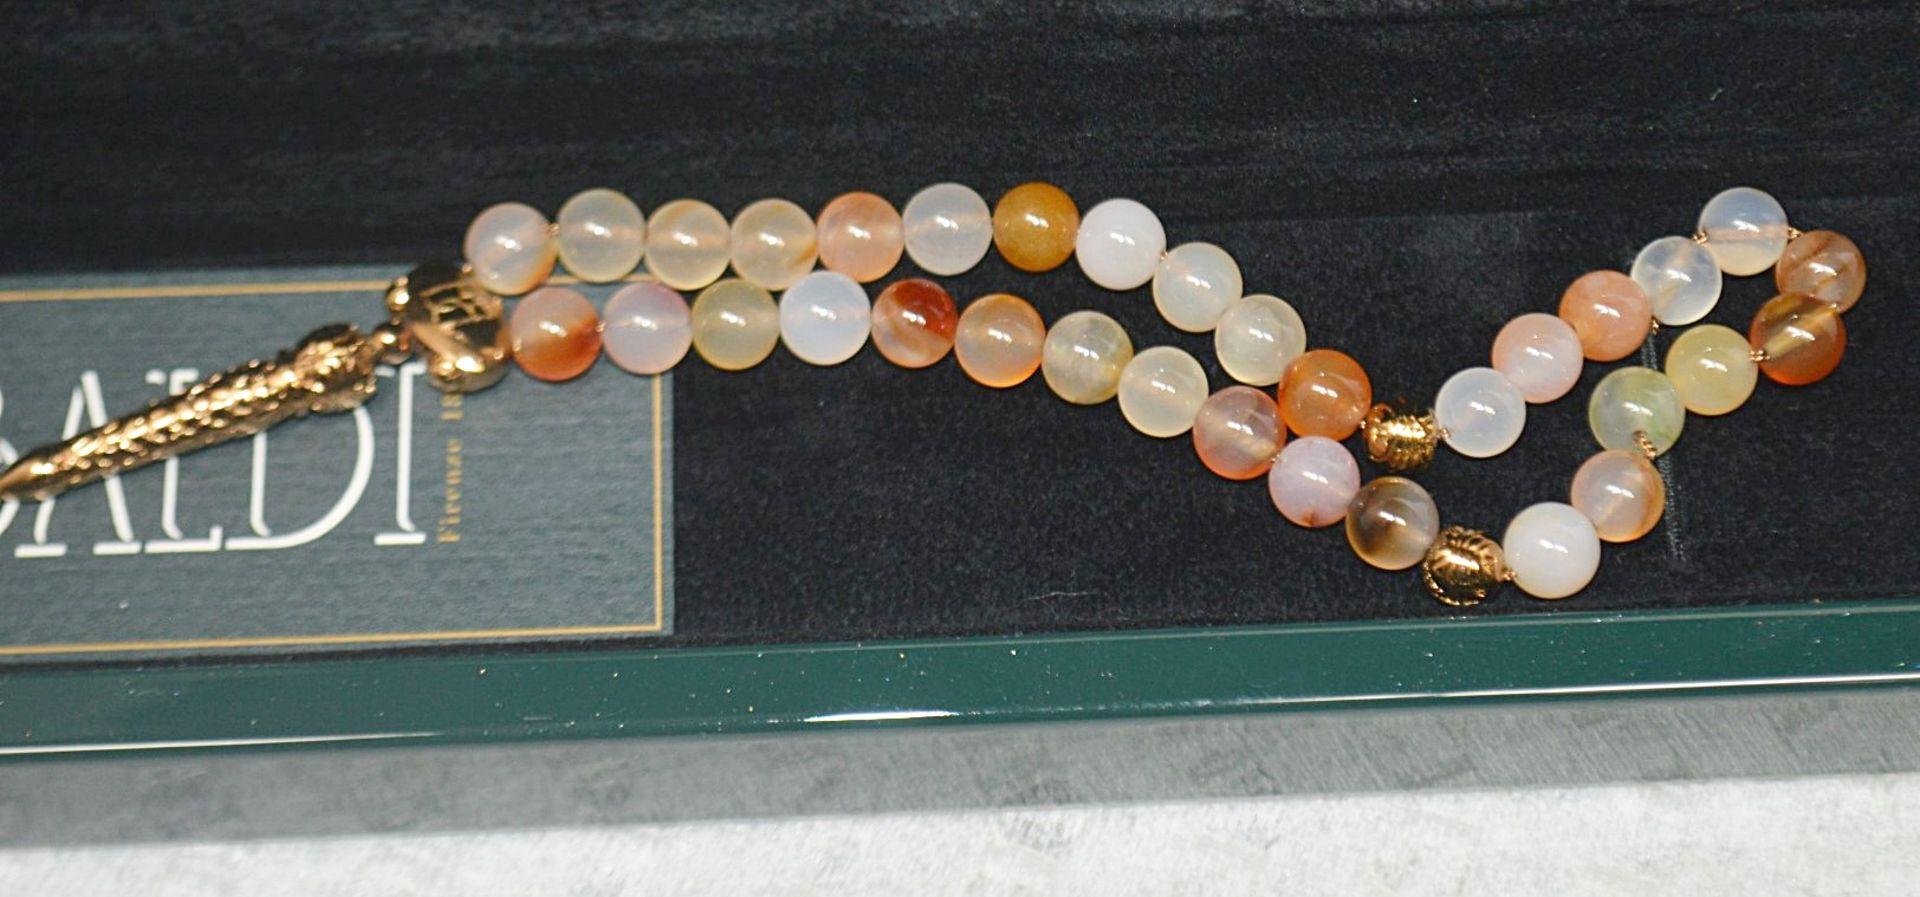 1 x BALDI 'Home Jewels' Italian Hand-crafted Artisan MISBAHA Prayer Beads In Cornelian Gemstone - Image 2 of 5